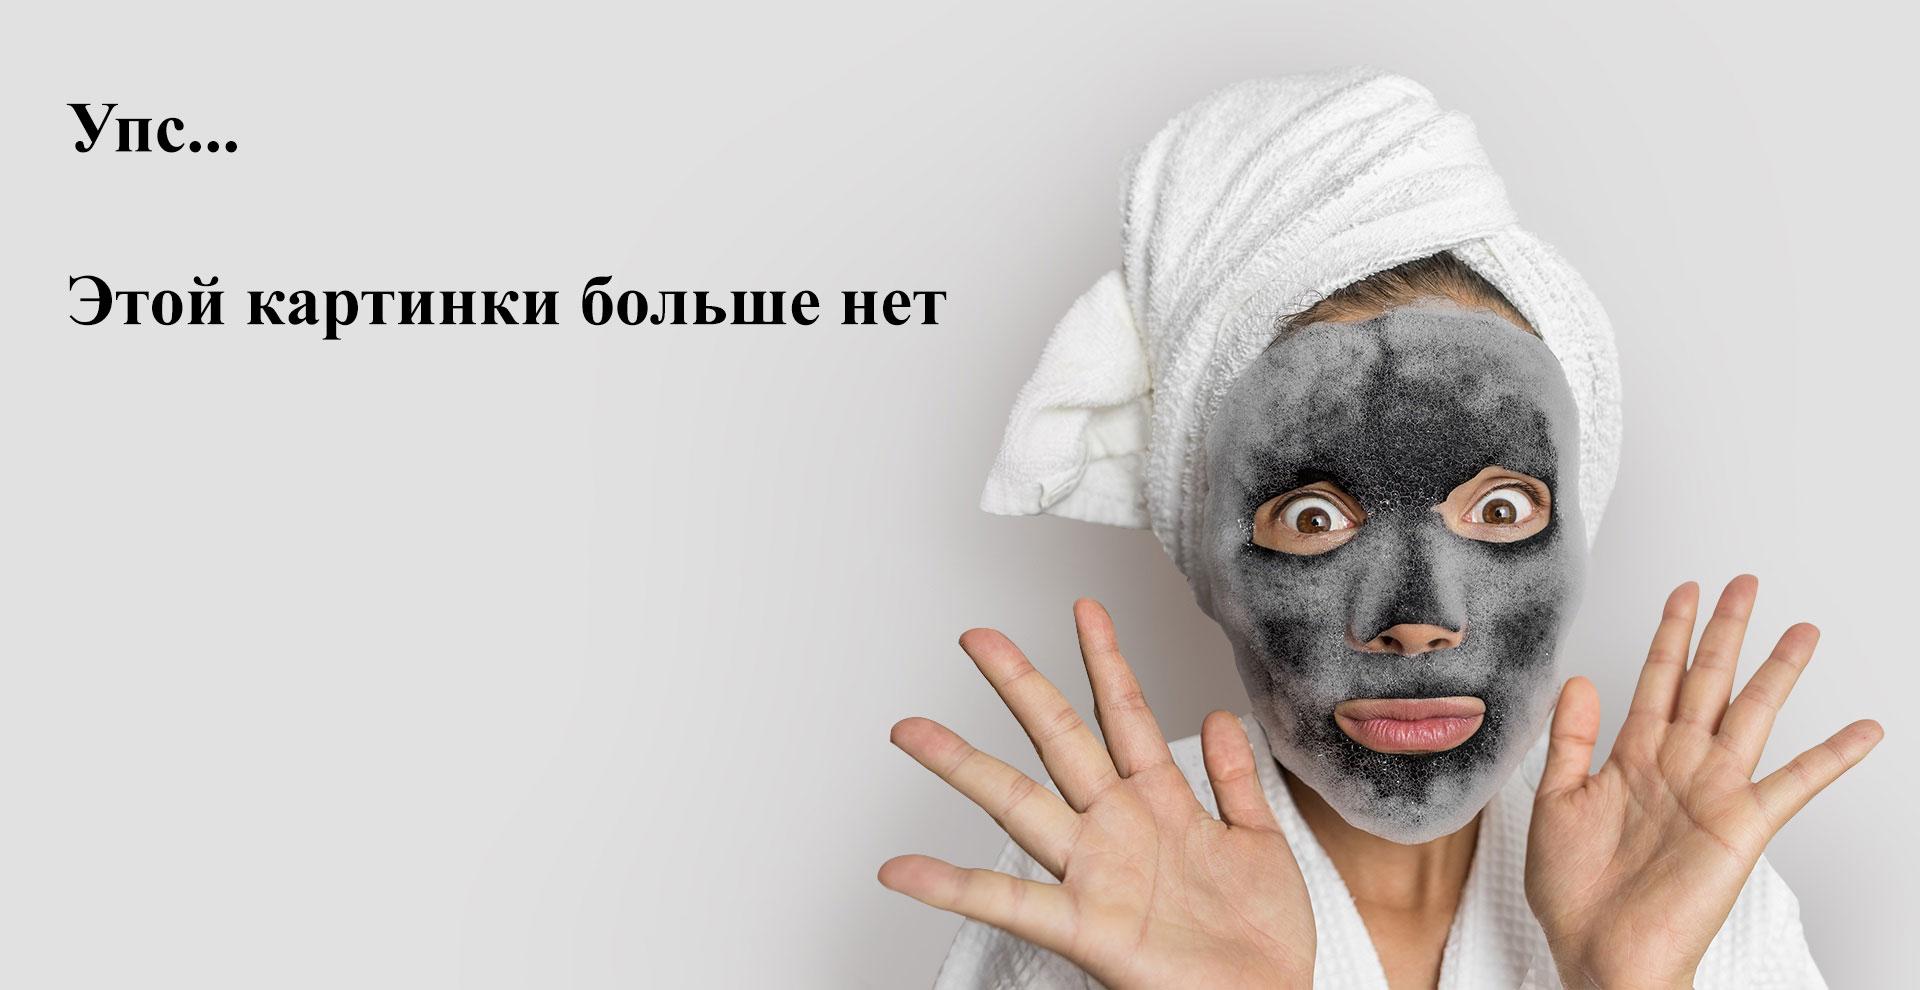 Patrisa Nail, Гель-лак «Кошачий Глаз» К3, Аметист